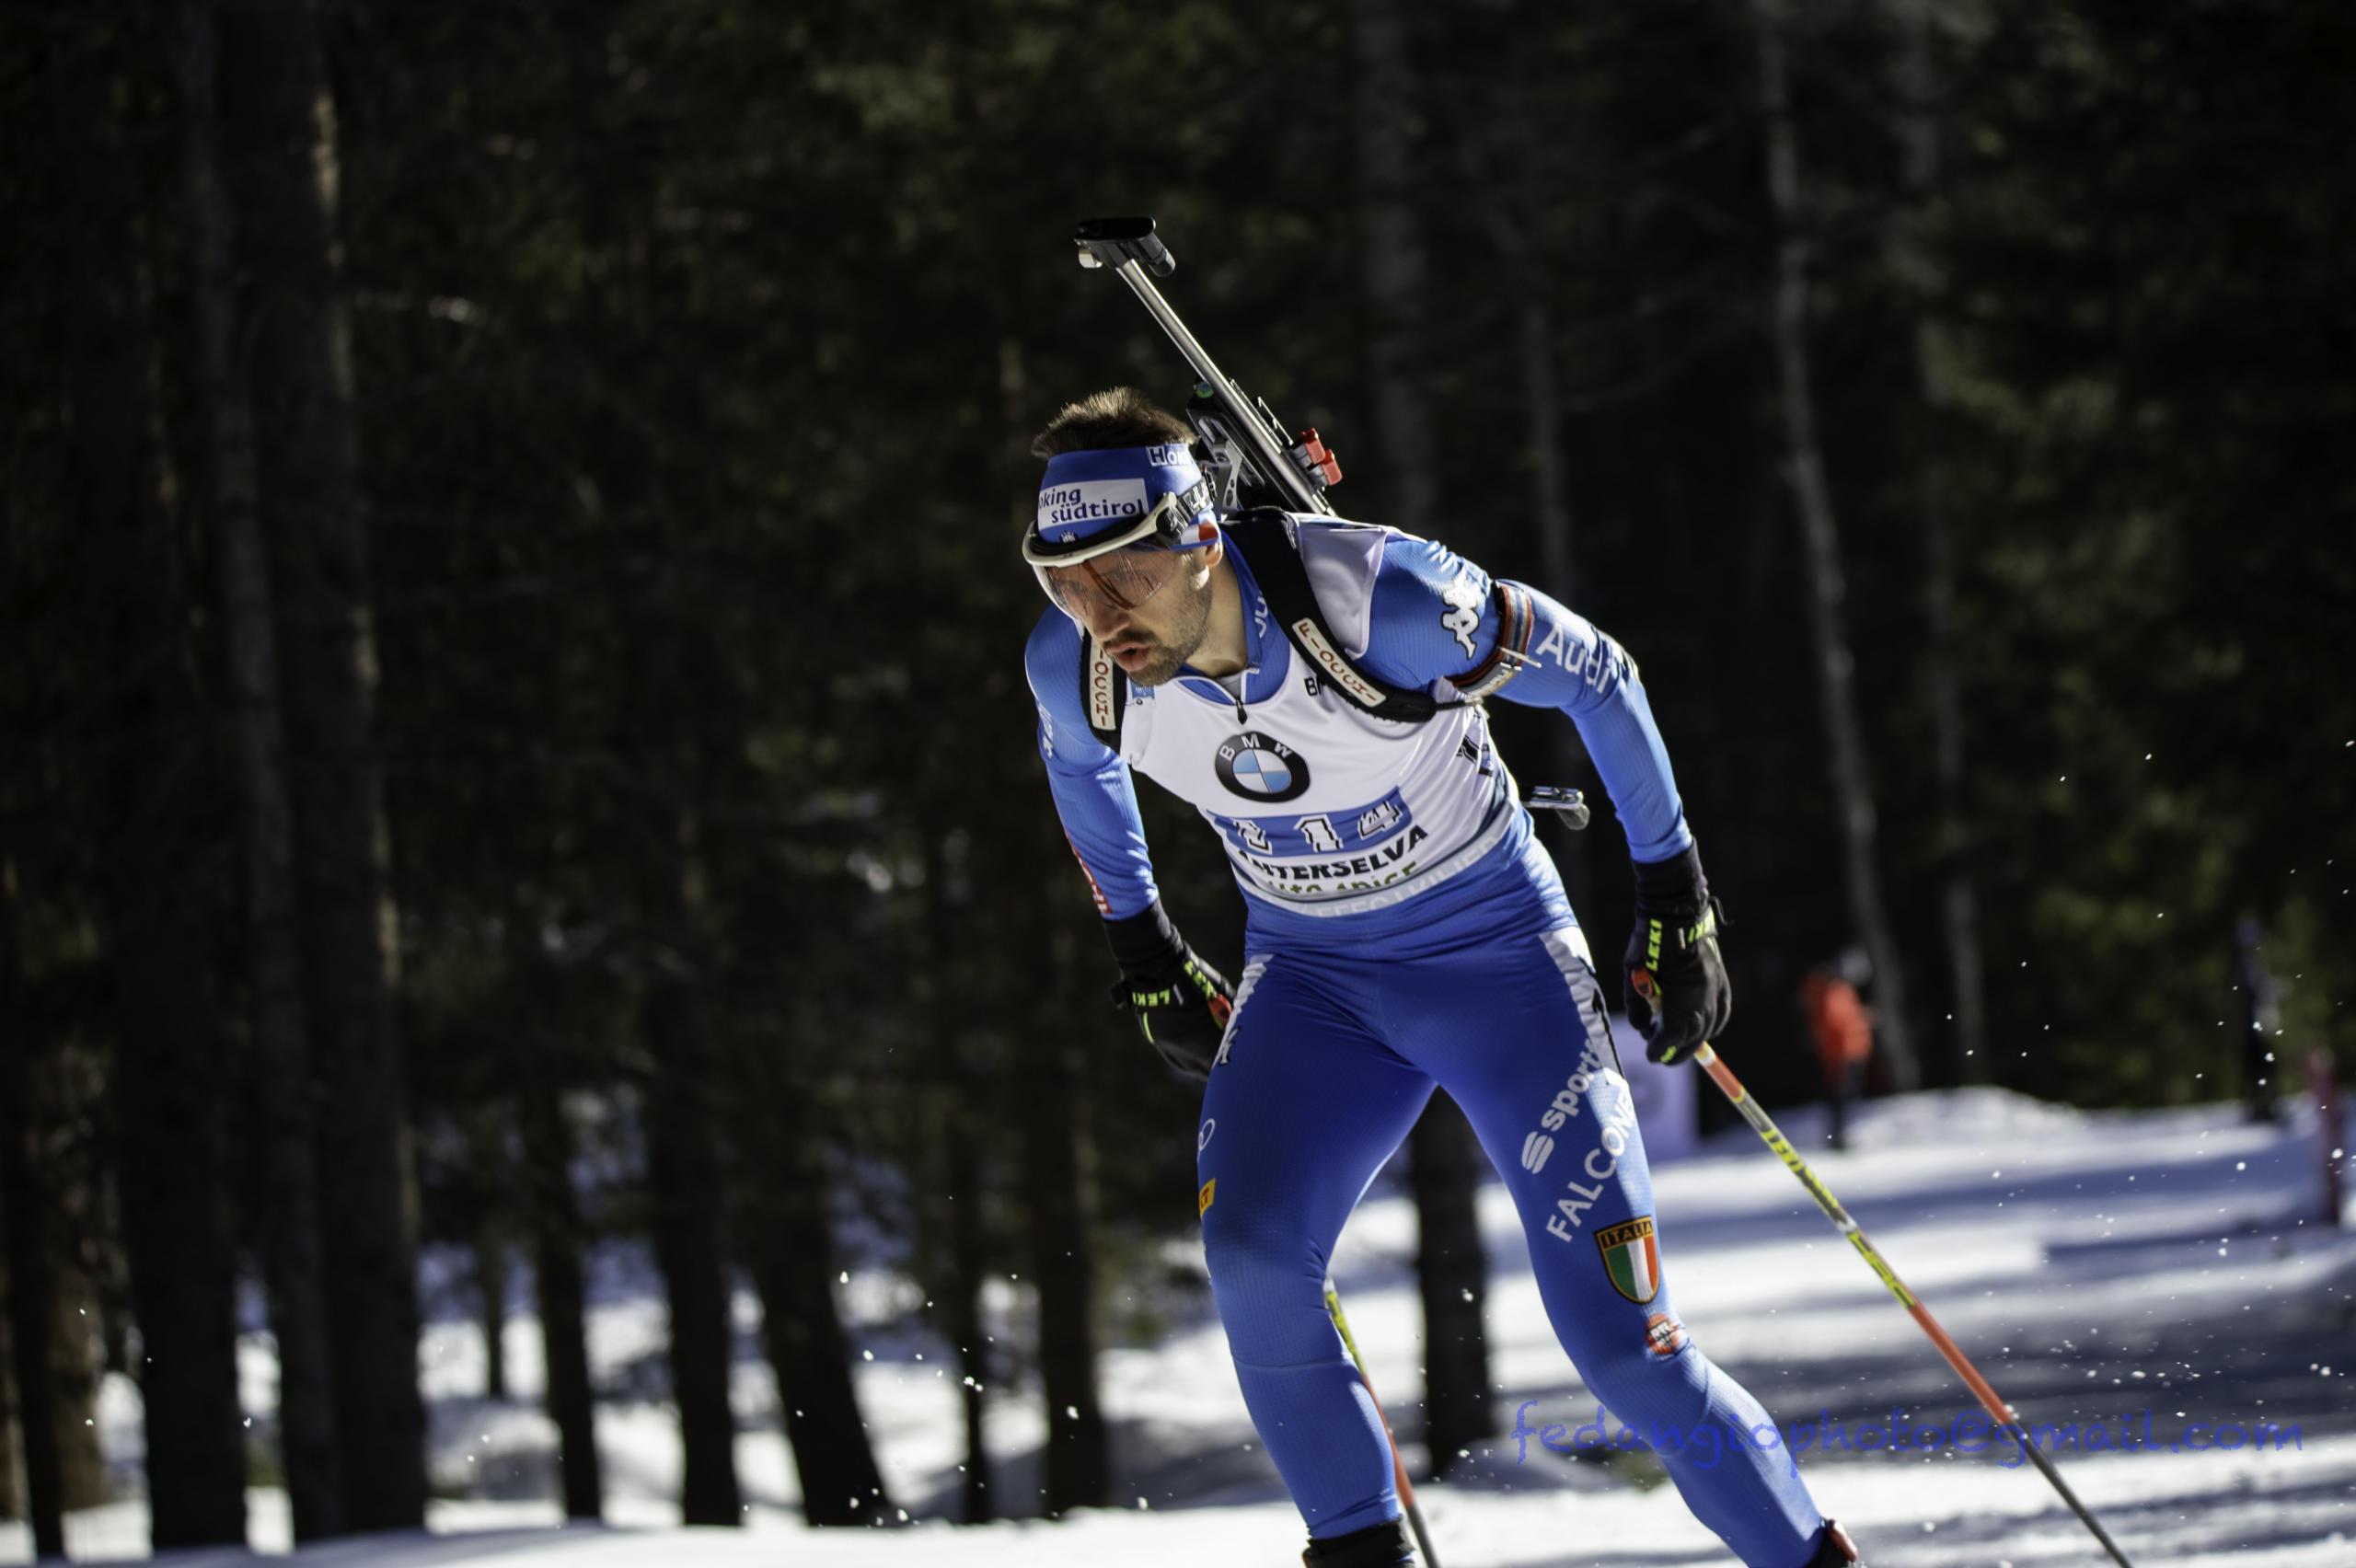 Biathlon |  Dominik Windisch assente a Kontiolahti per esiti contrastanti ai test per il Covid-19